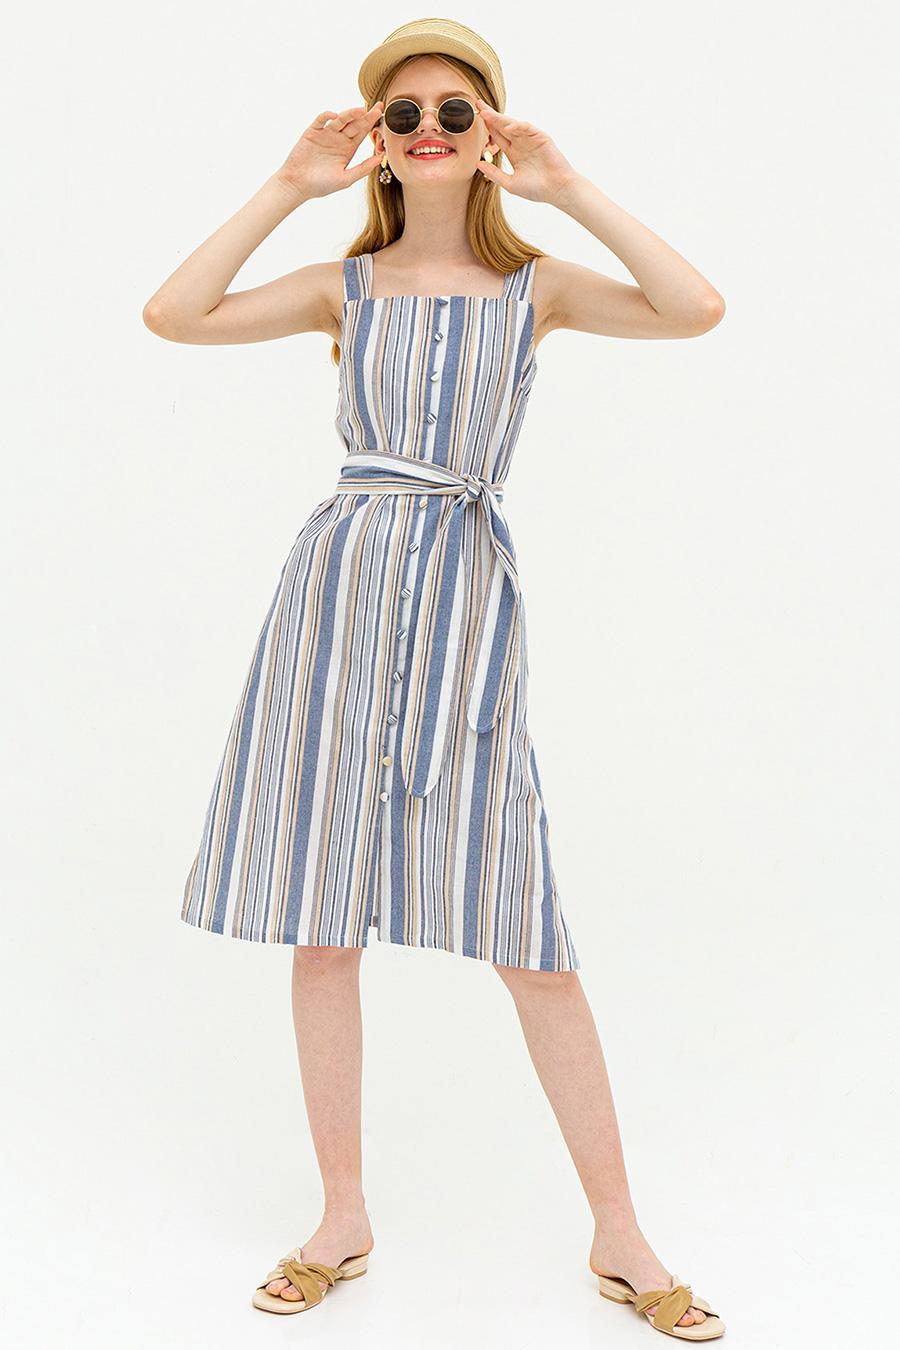 CAROLE DRESS - MADDIE STRIPE [BY MODPARADE]